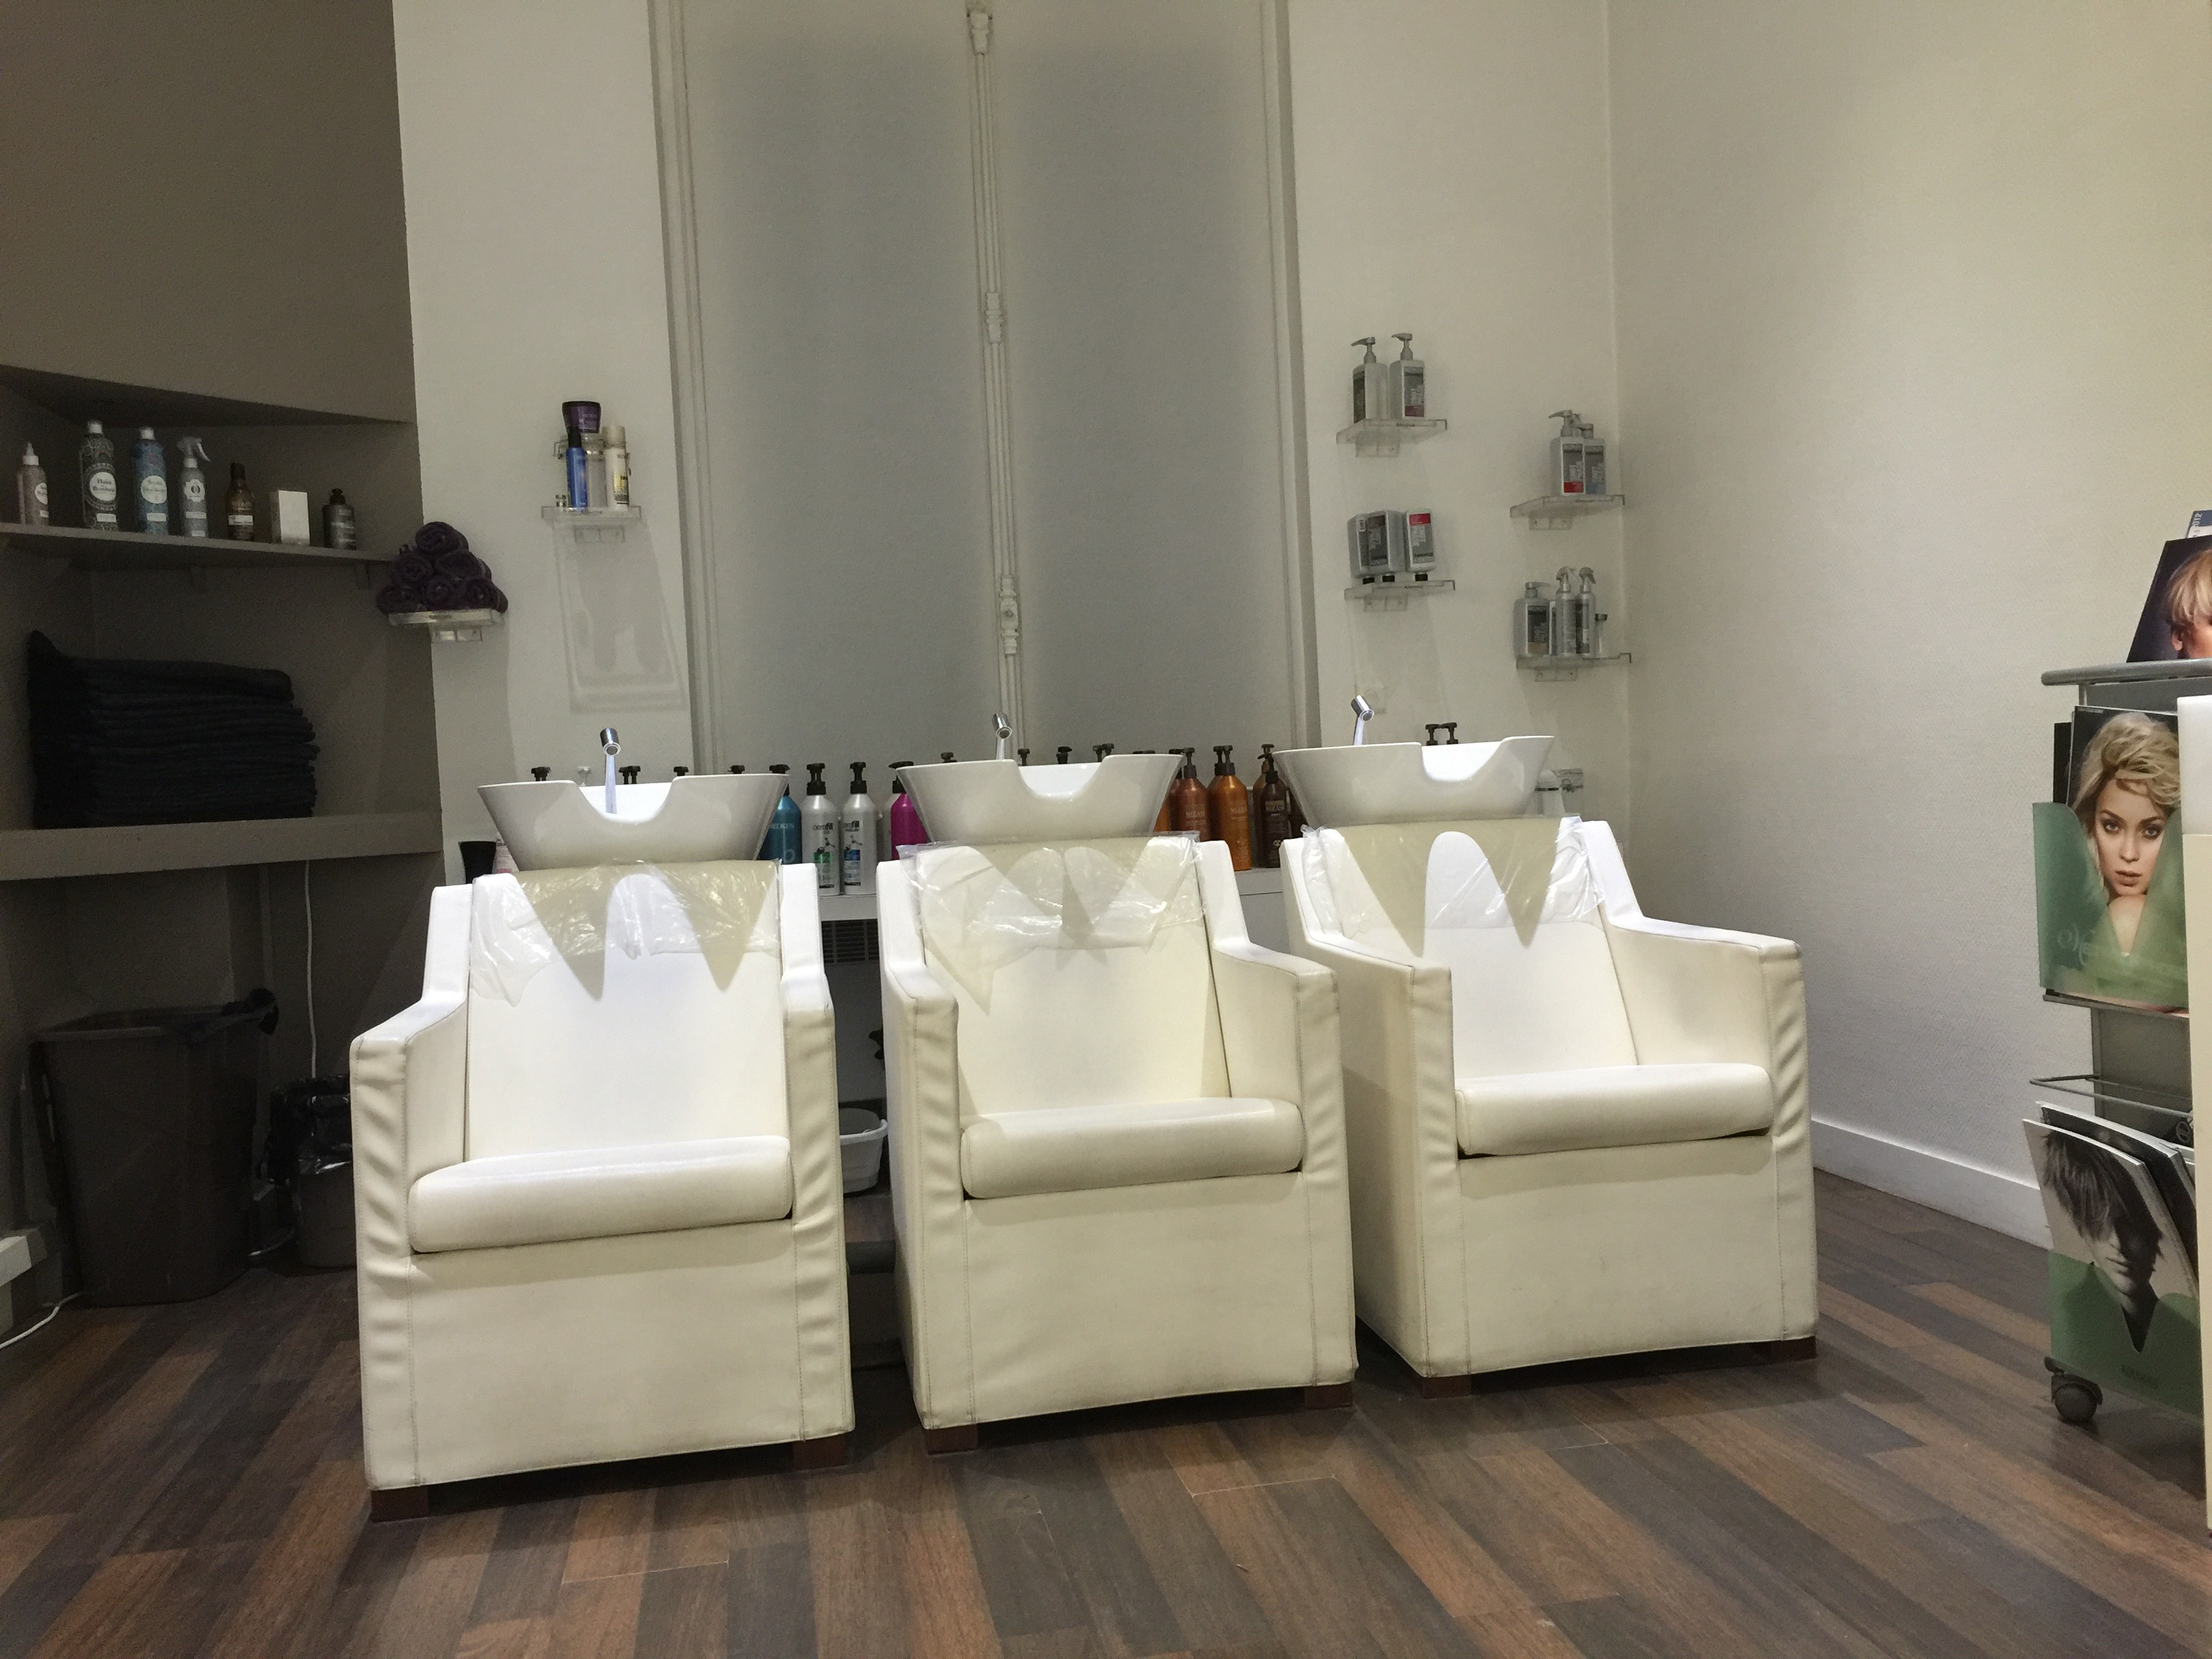 Salon alexandre henry attache ralise au salon sophie for Lissage bresilien franck provost salon